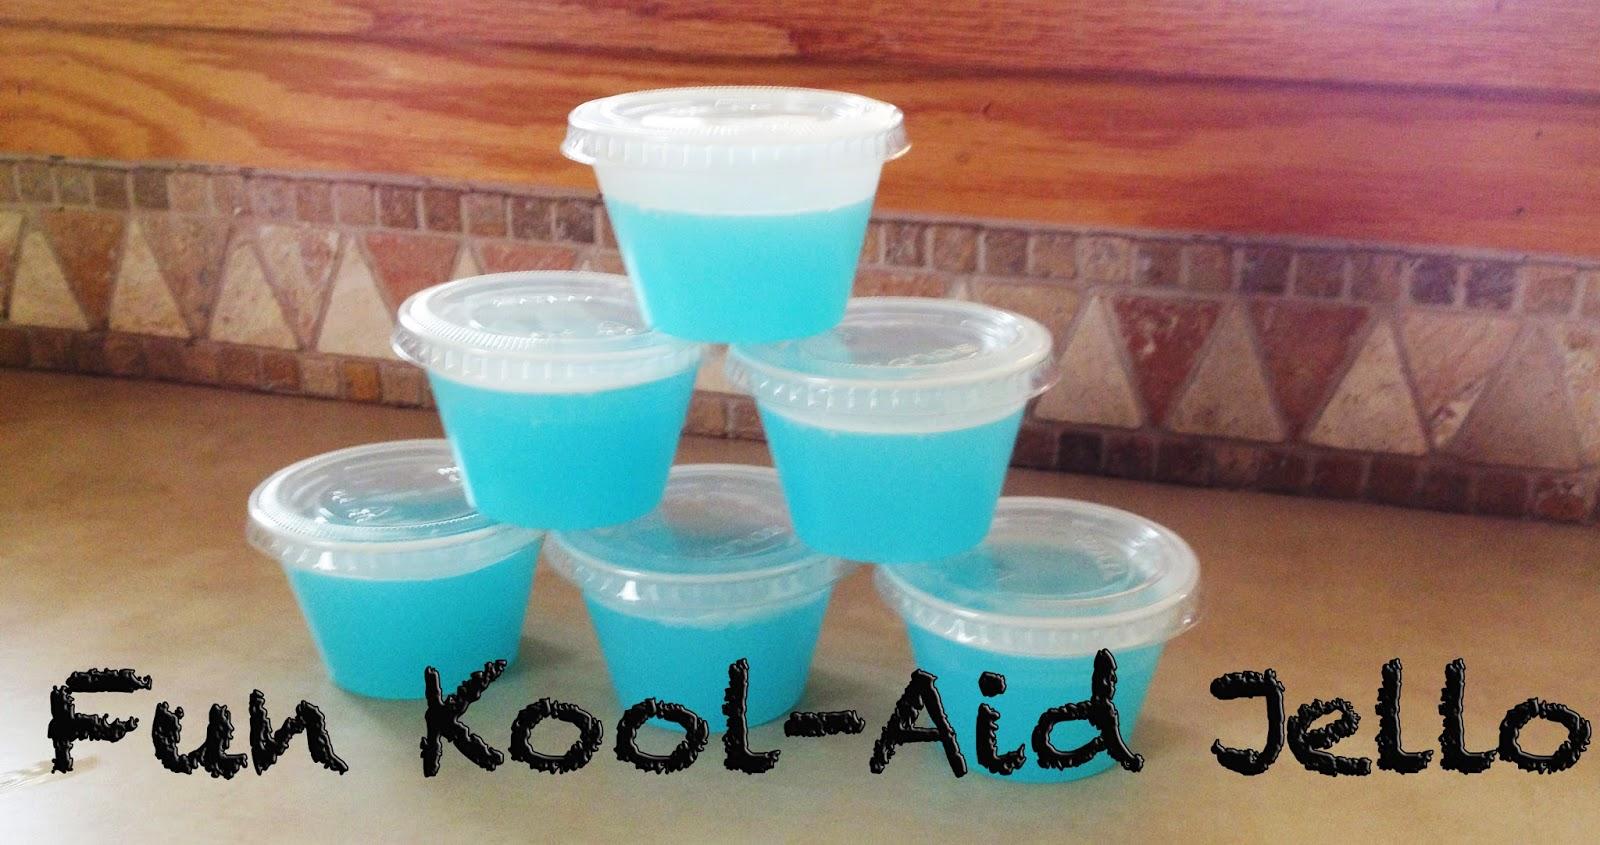 Kool-aid Jello